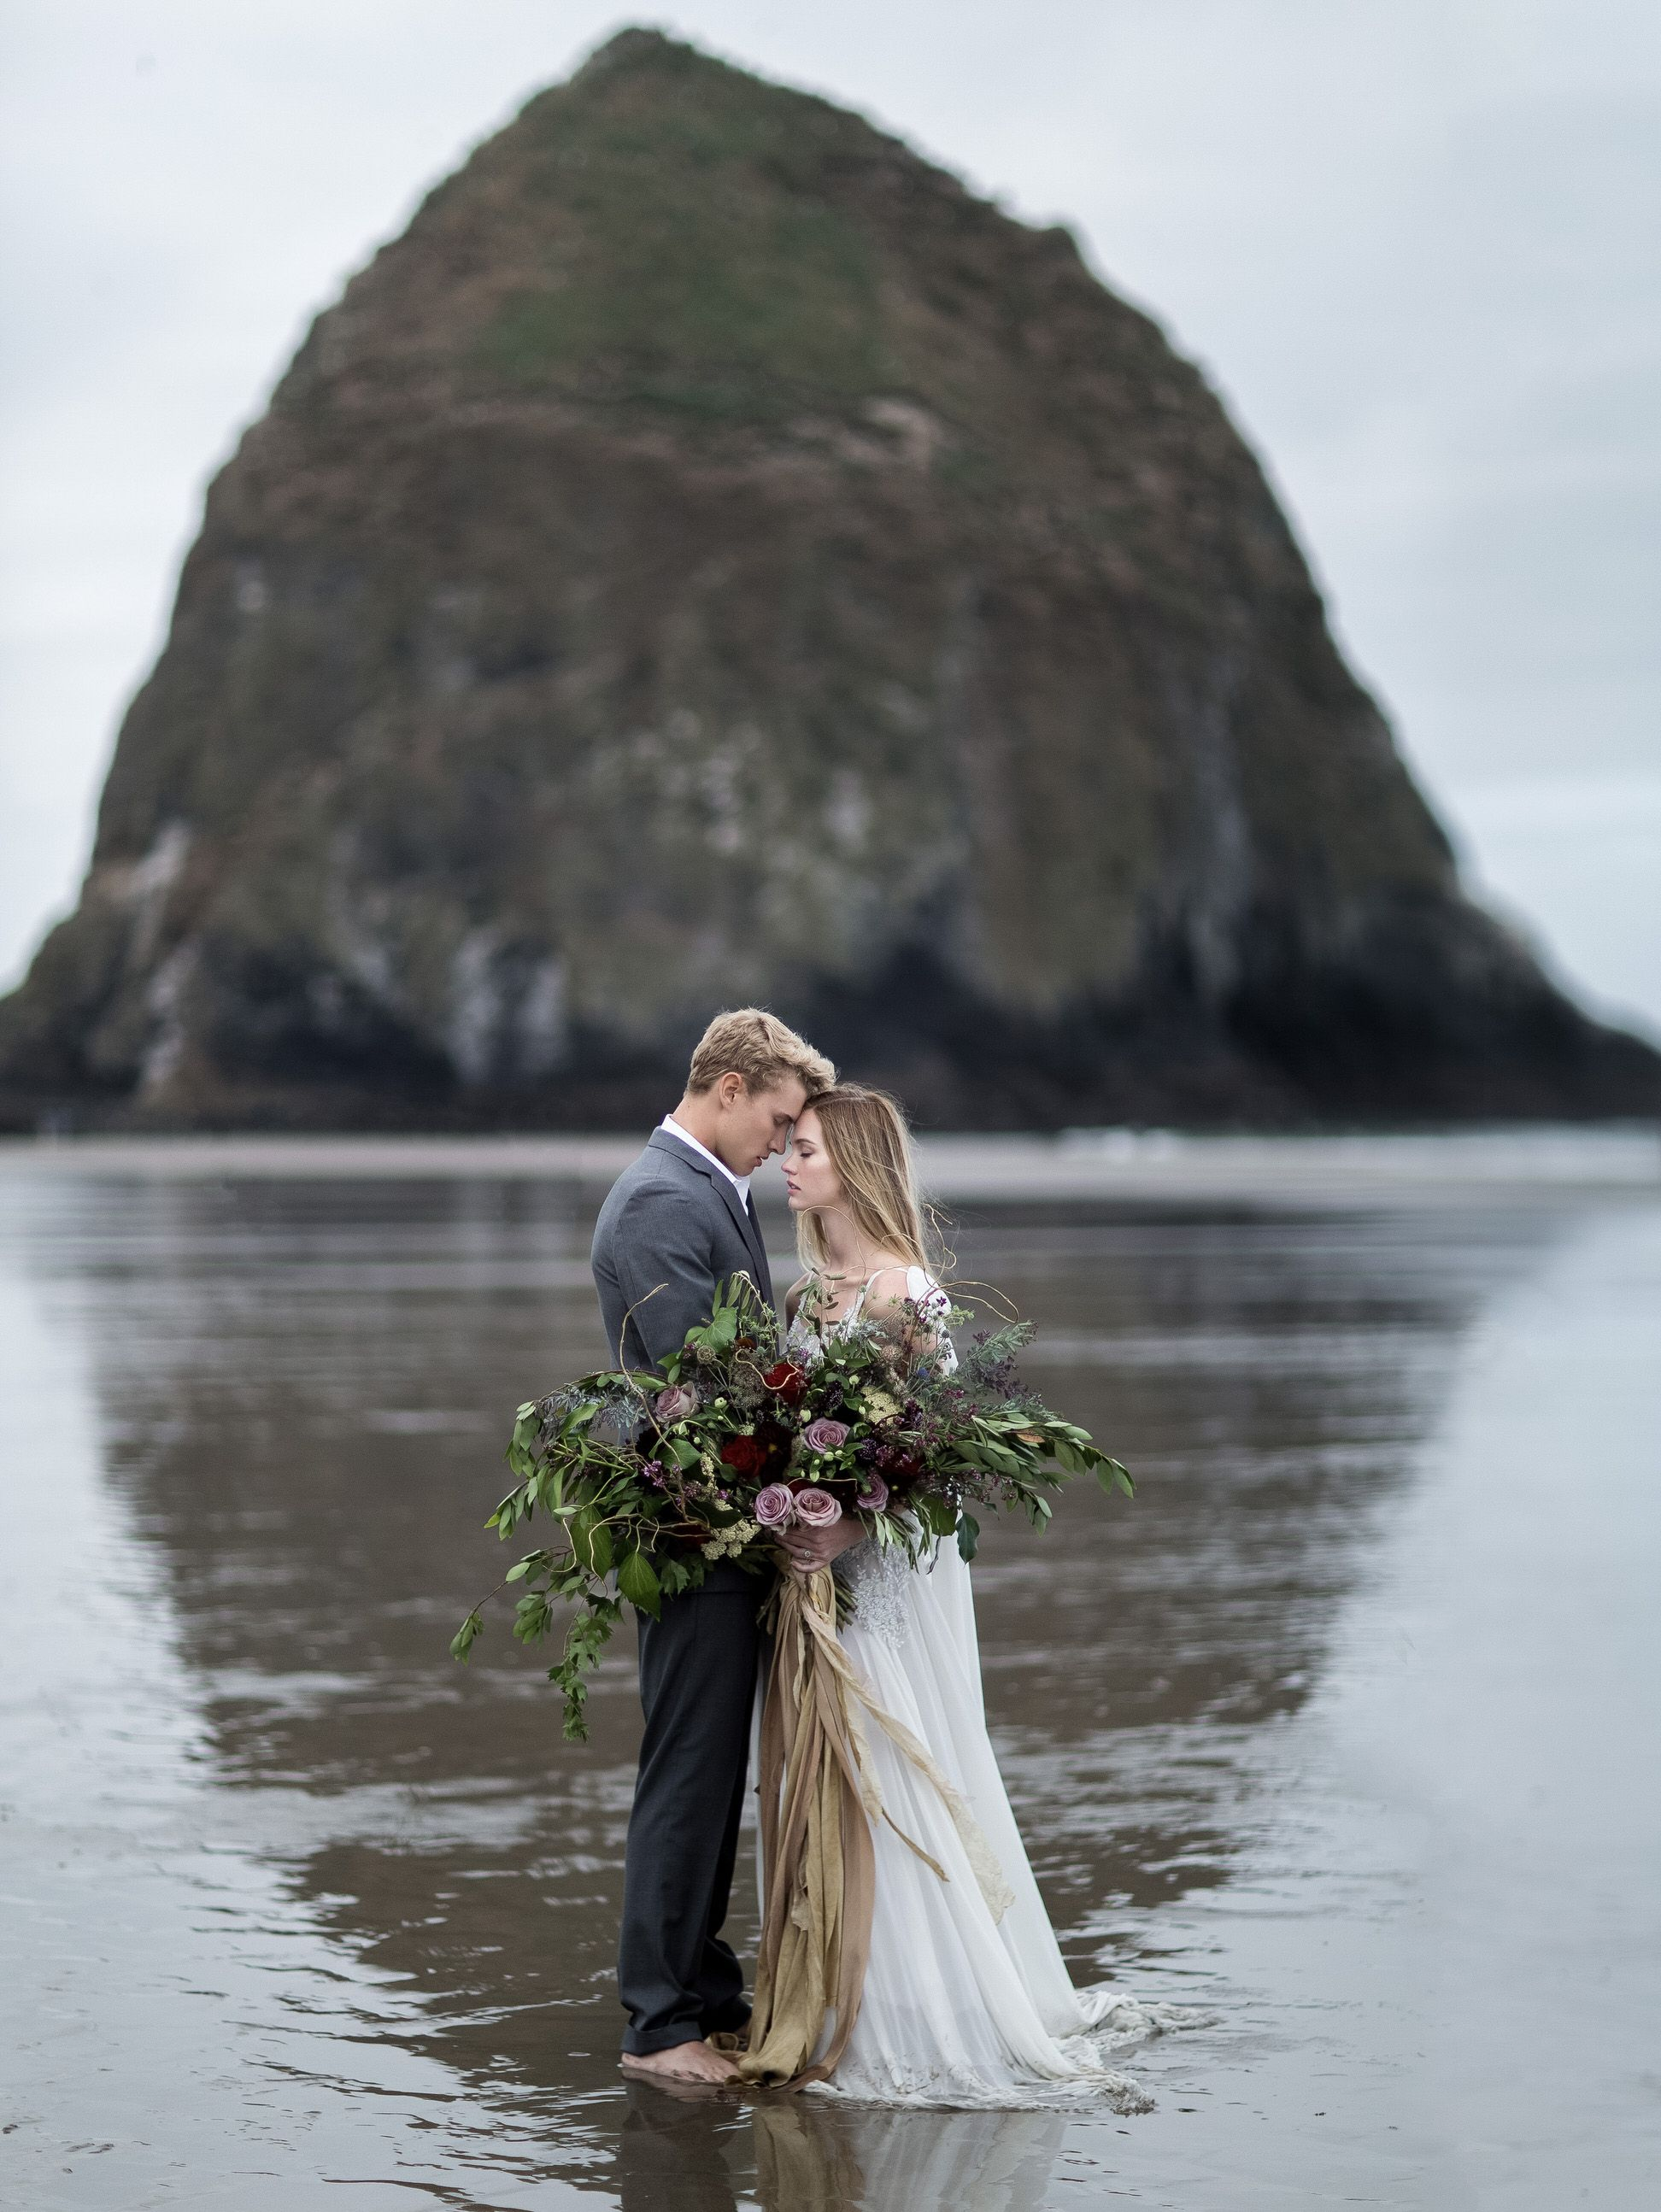 Cannon Beach Wedding Inspiration From The Oregon Coast Work Tyler Rye Http Tylerrye